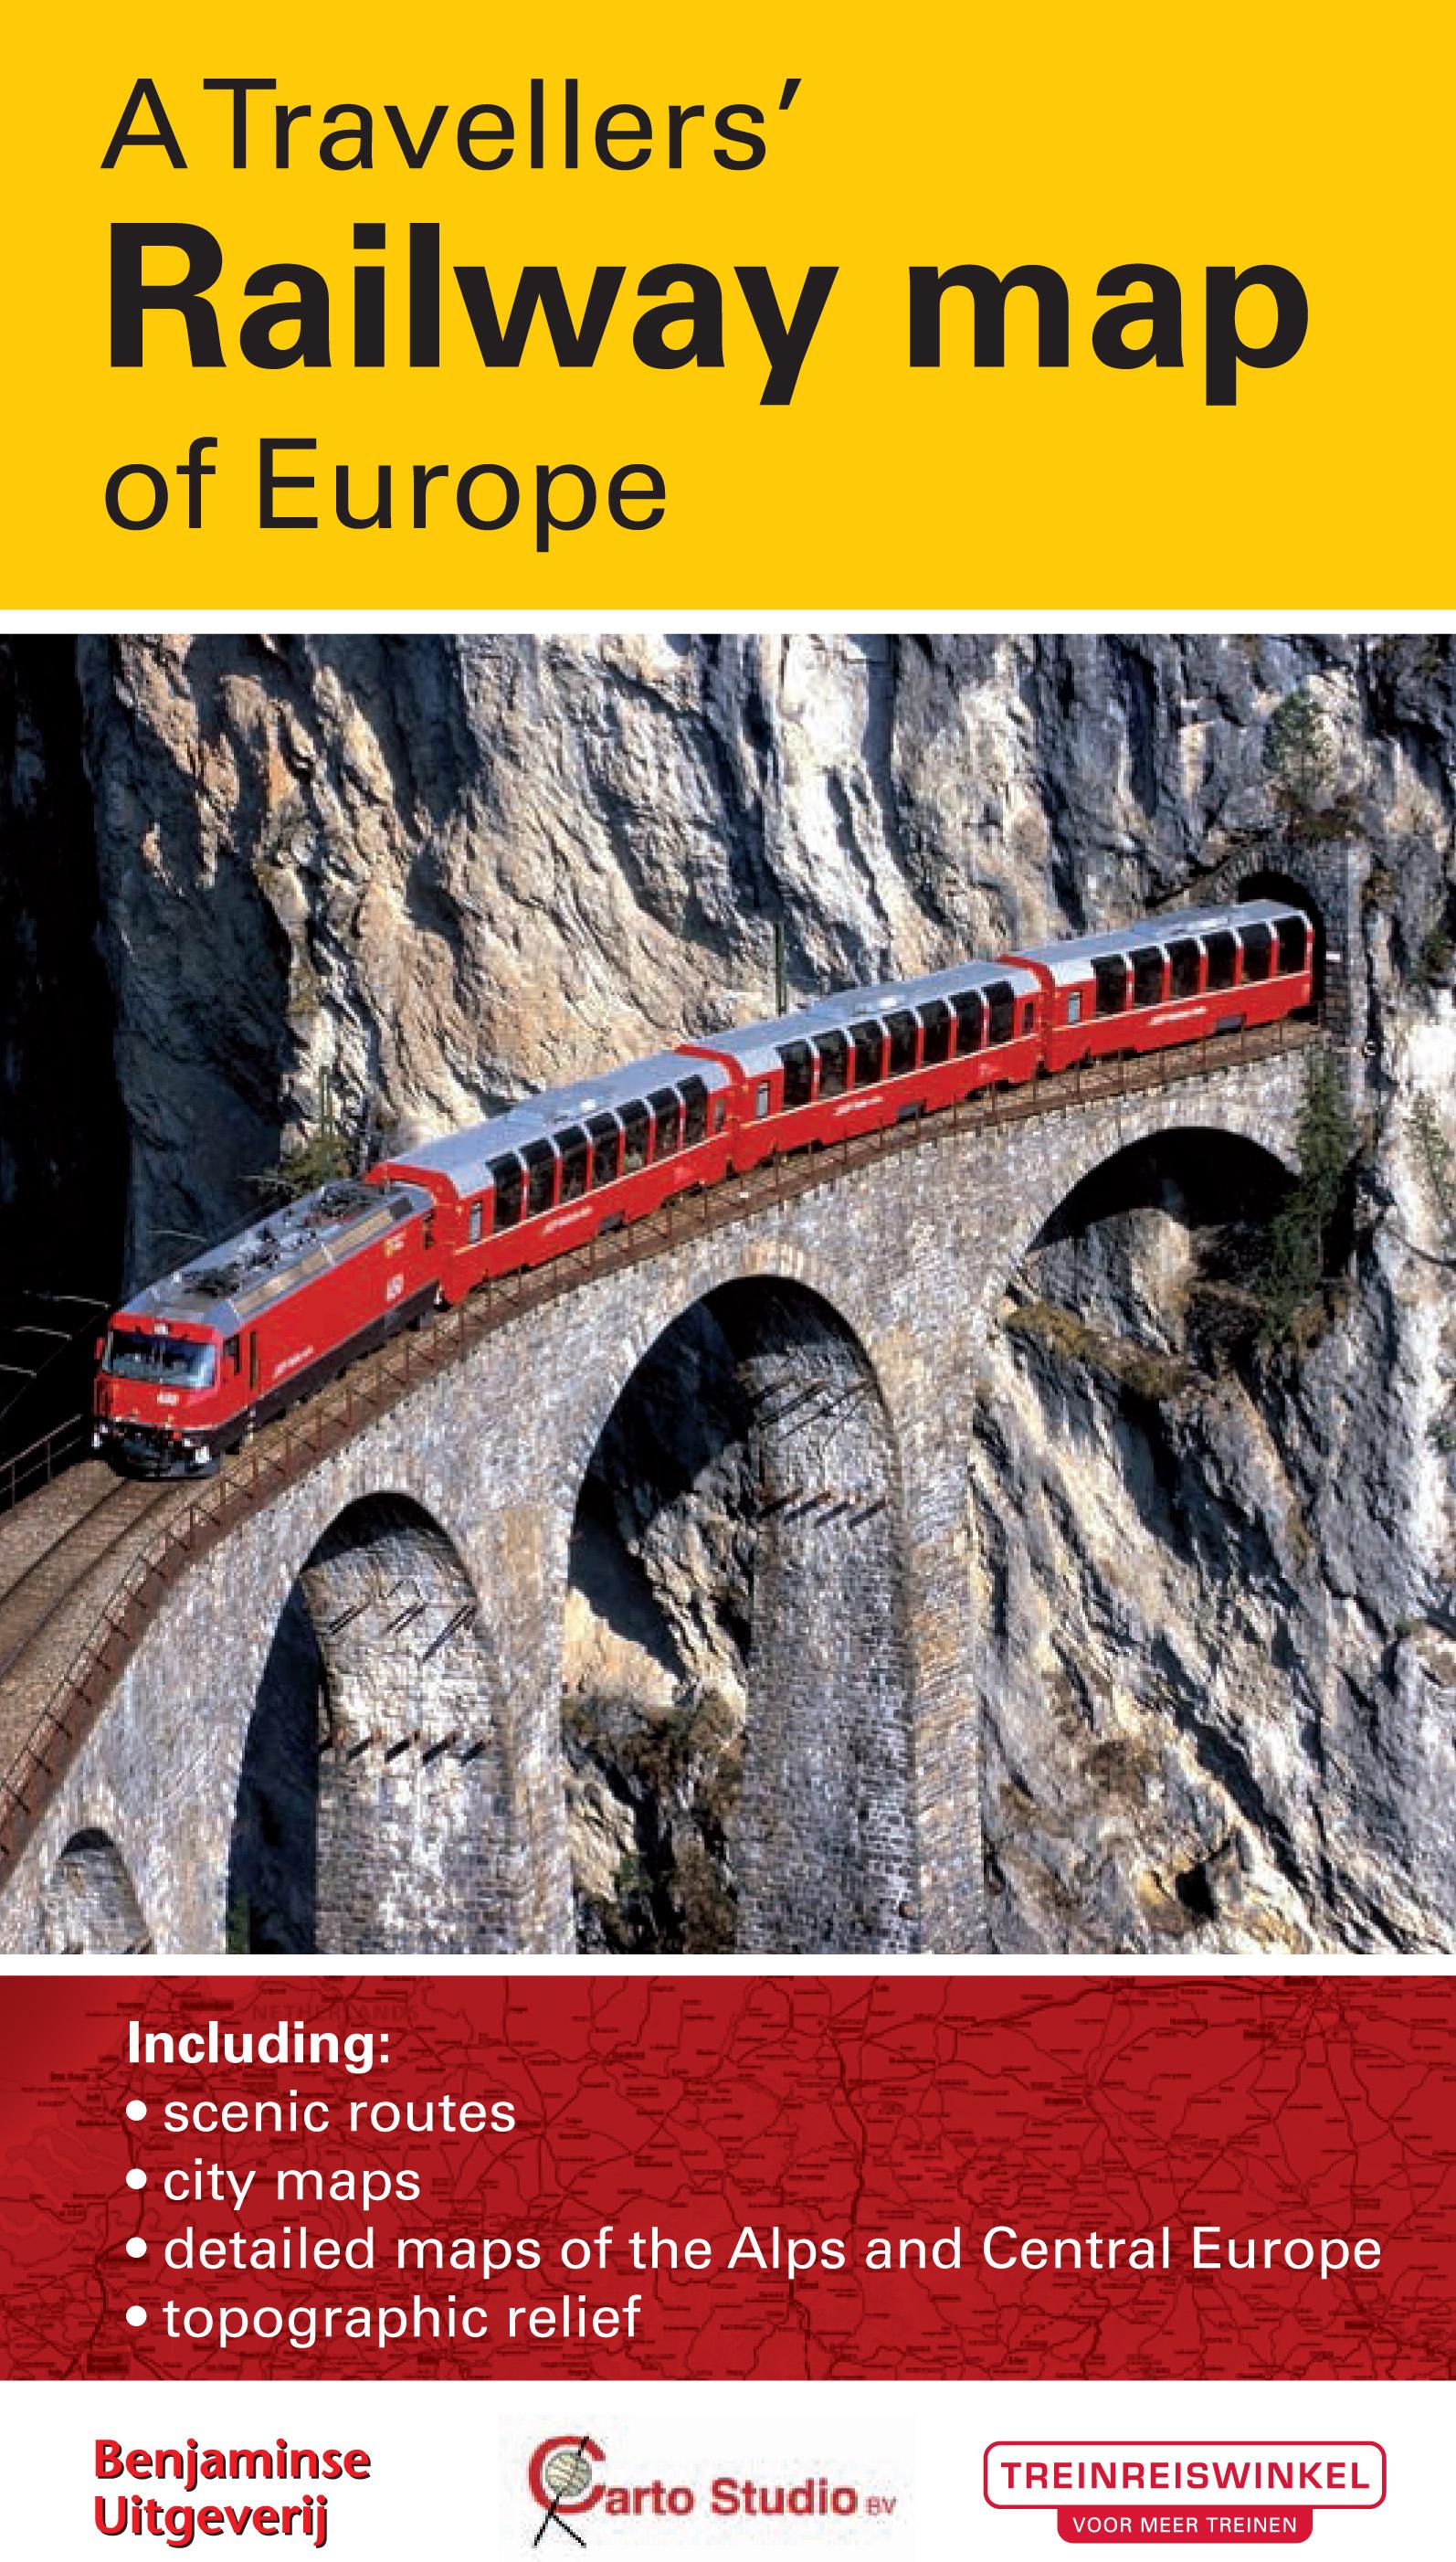 Europe Railway traveller's map